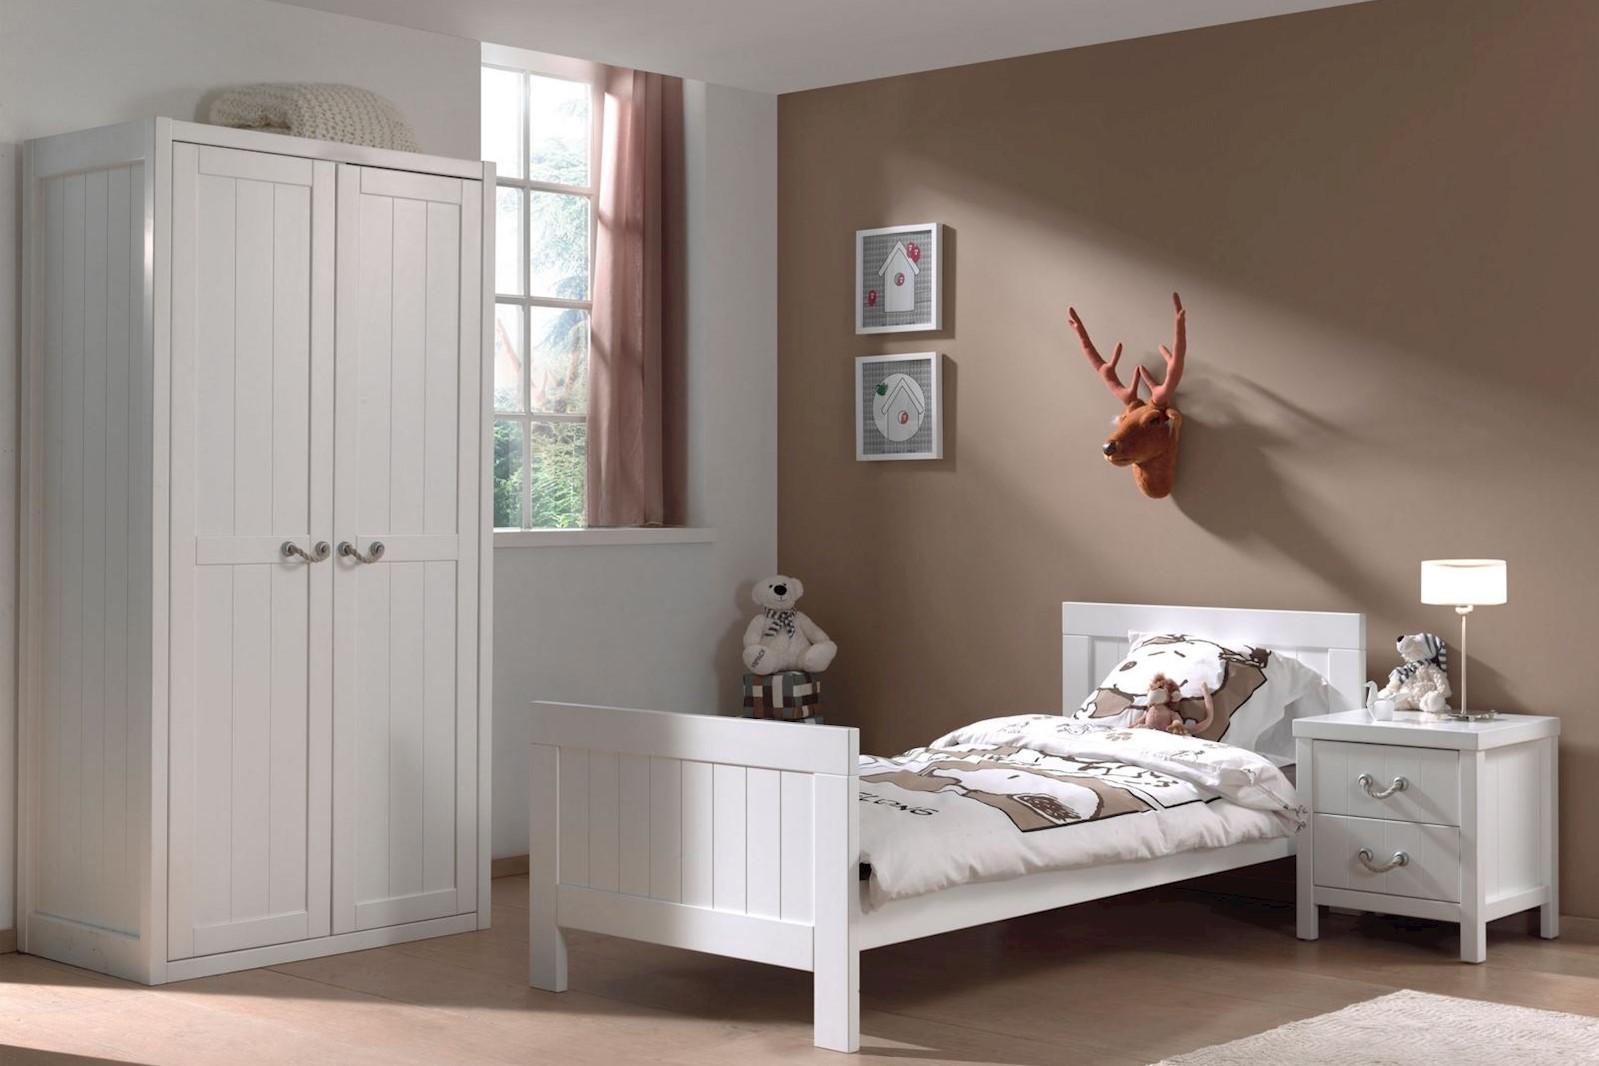 Kinderbett Set Iny 3-teilig in Weiß